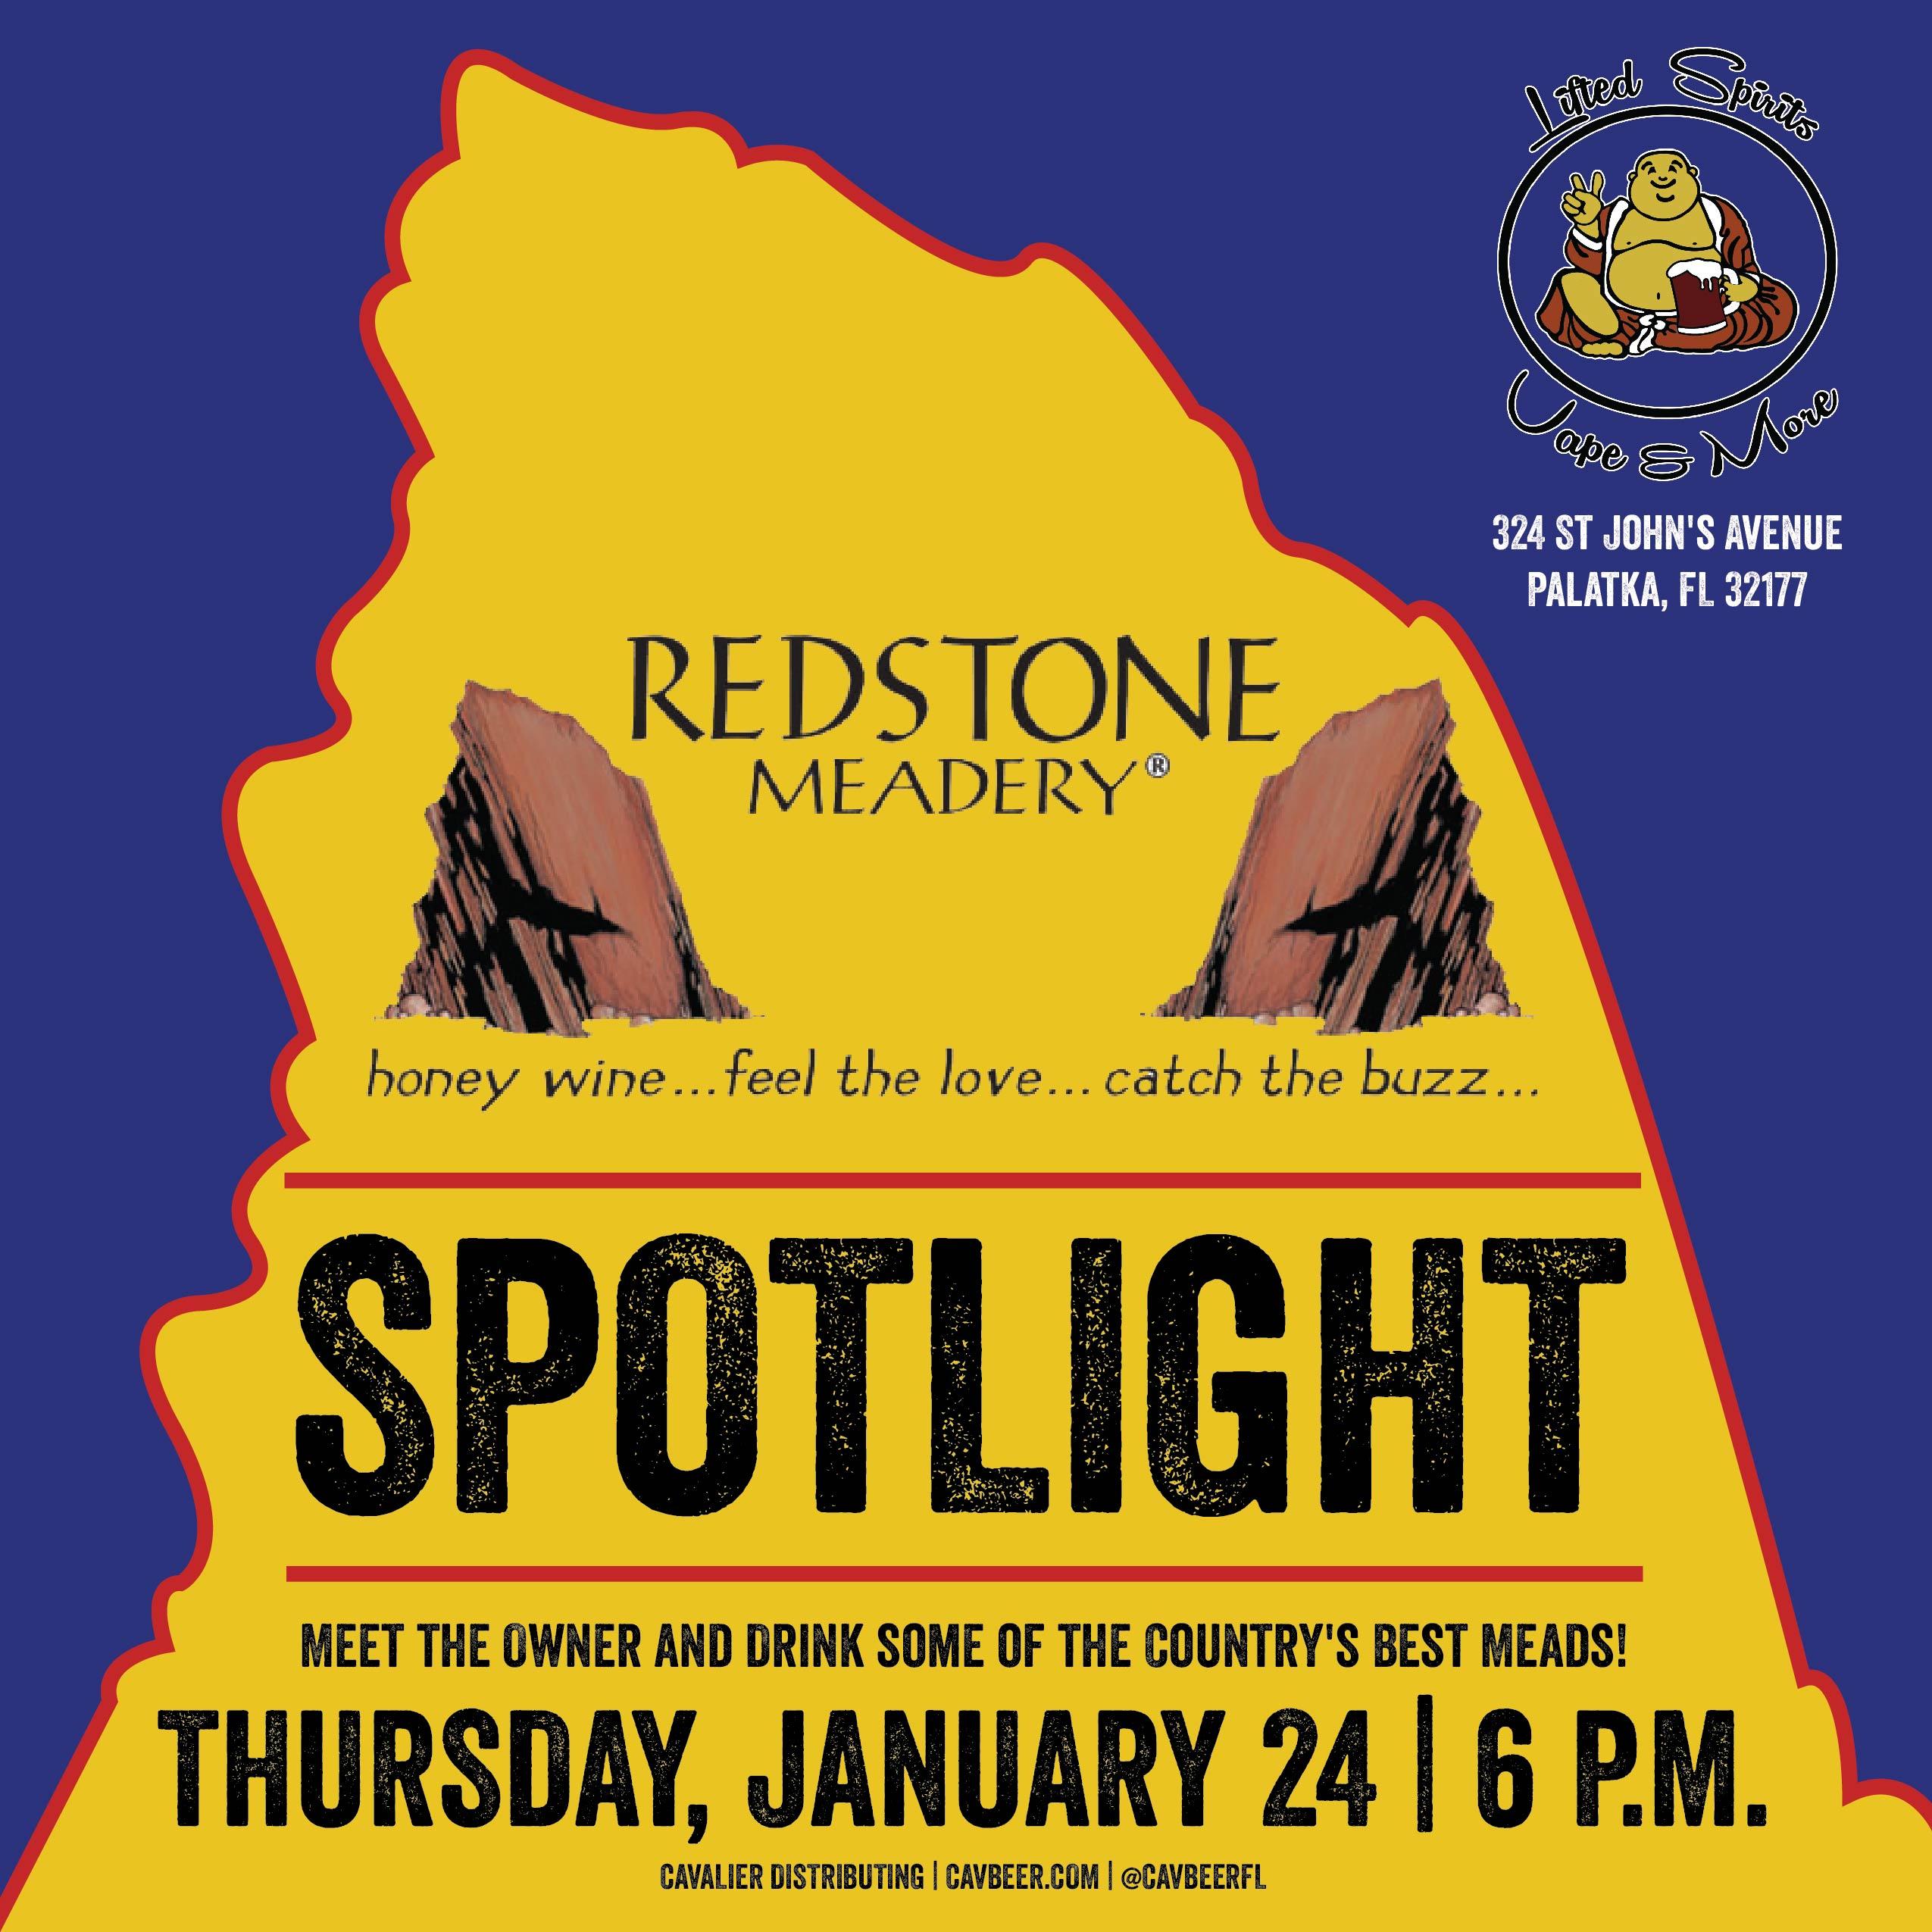 Redstone Meadery Sportlight @ Lifted Spirits Vape & More | Cavalier